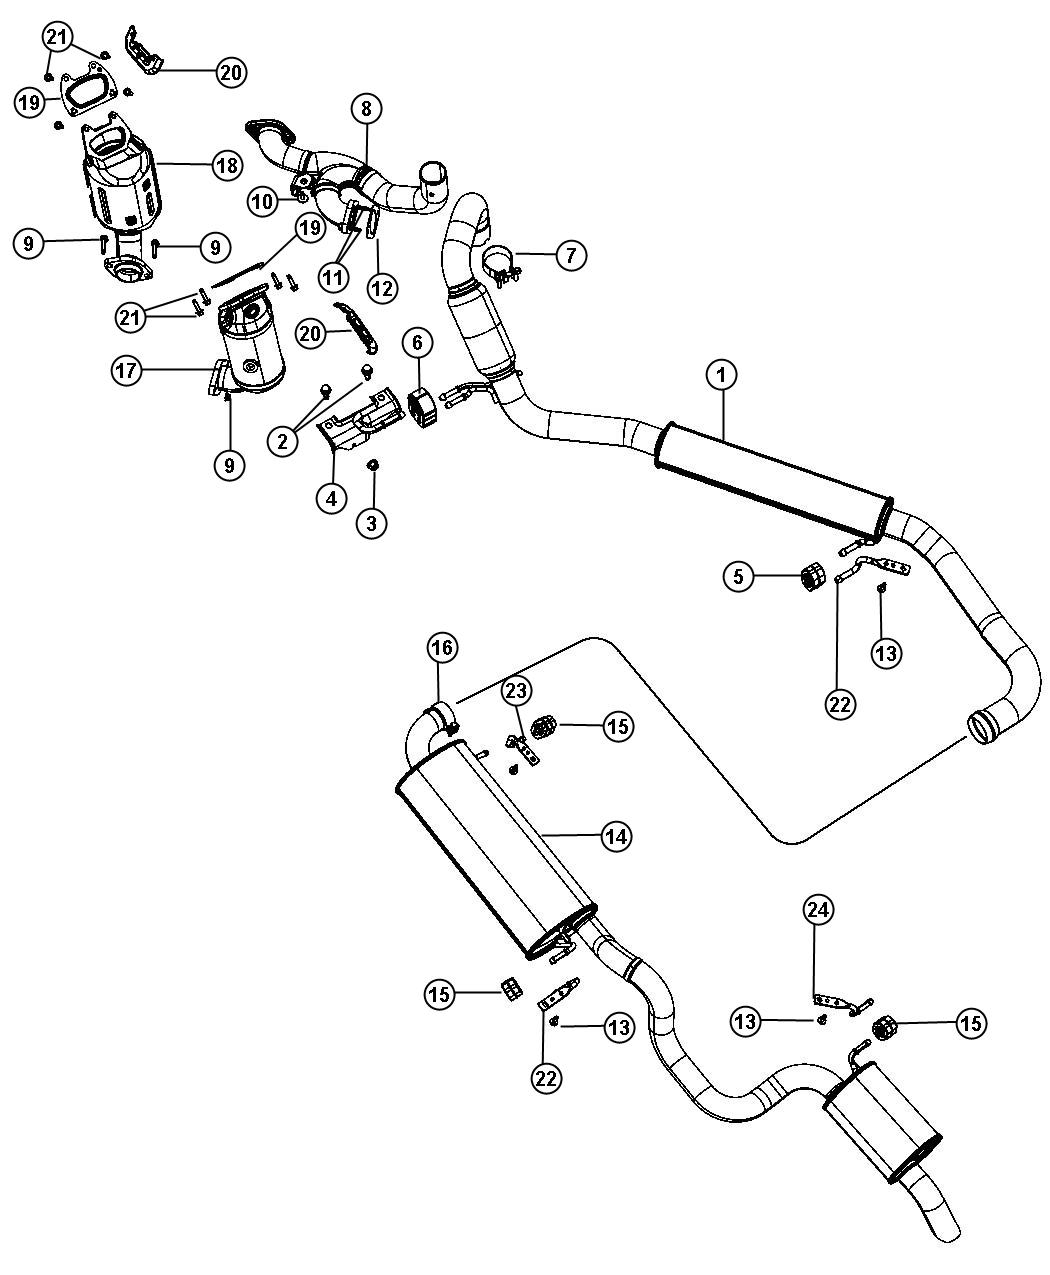 Dodge Grand Caravan Engine Diagram Full Hd Quality